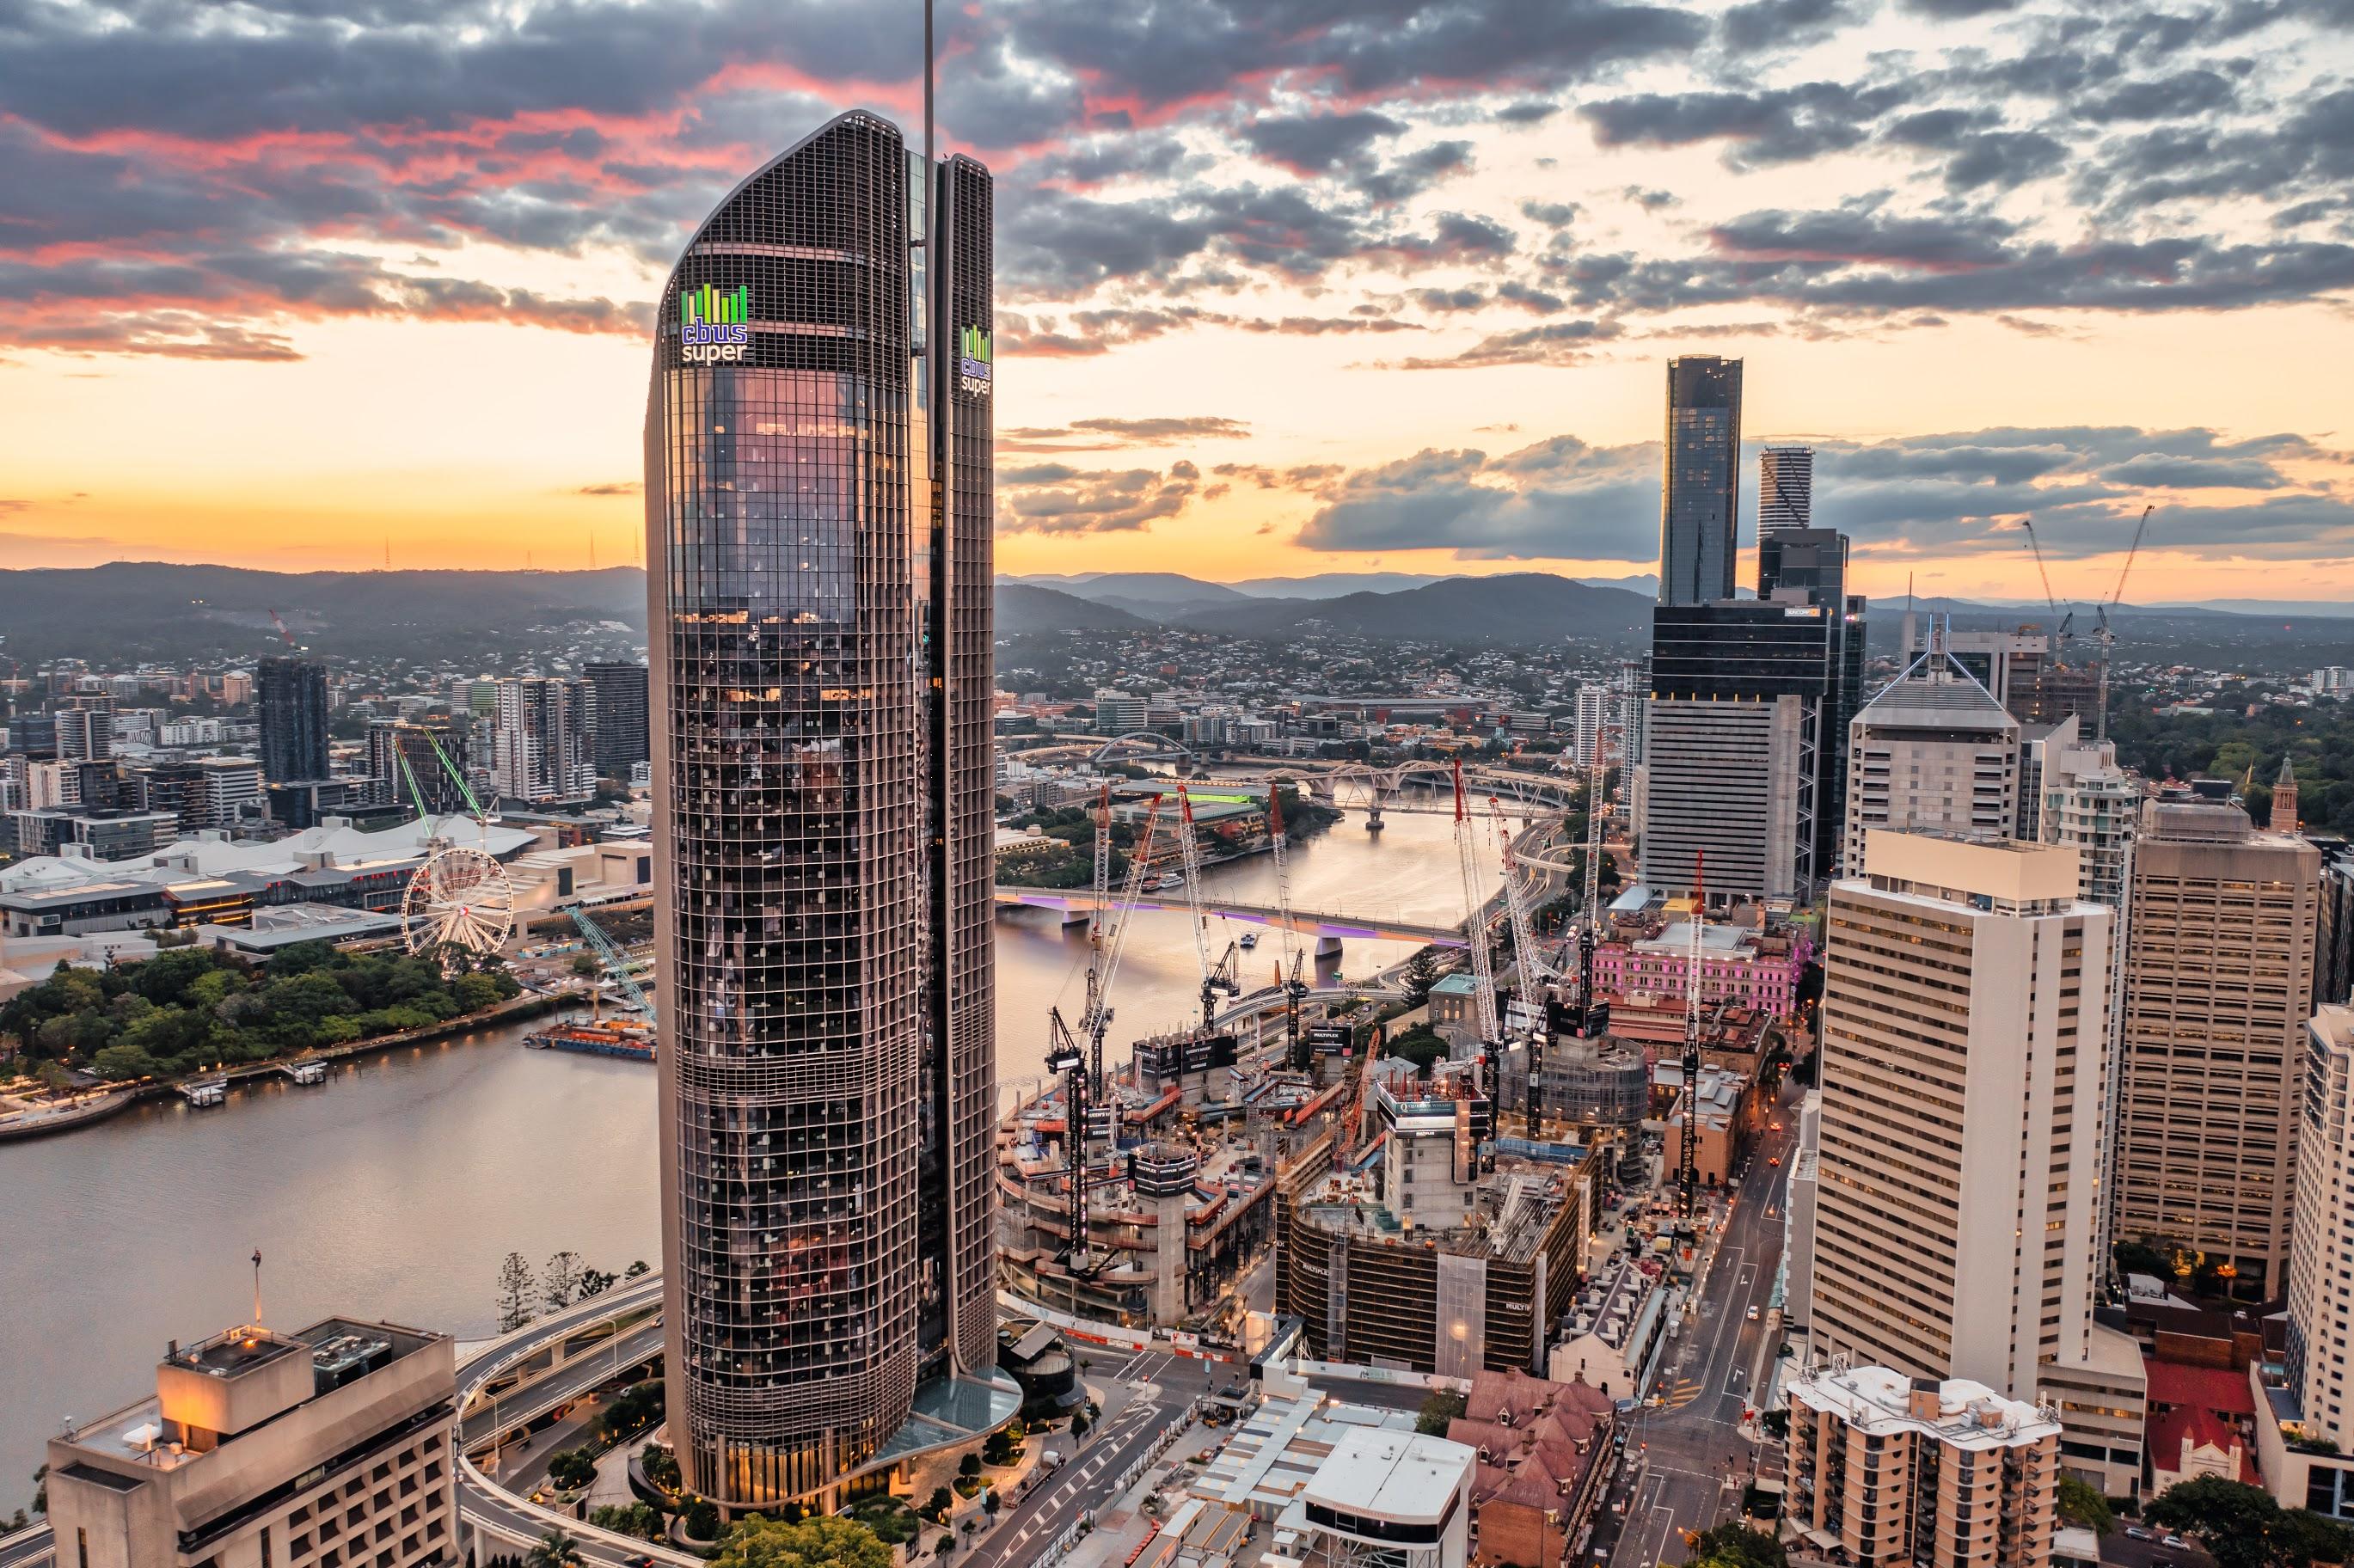 Brisbane's impressive infrastructure pipeline sets the agenda for incentive travel